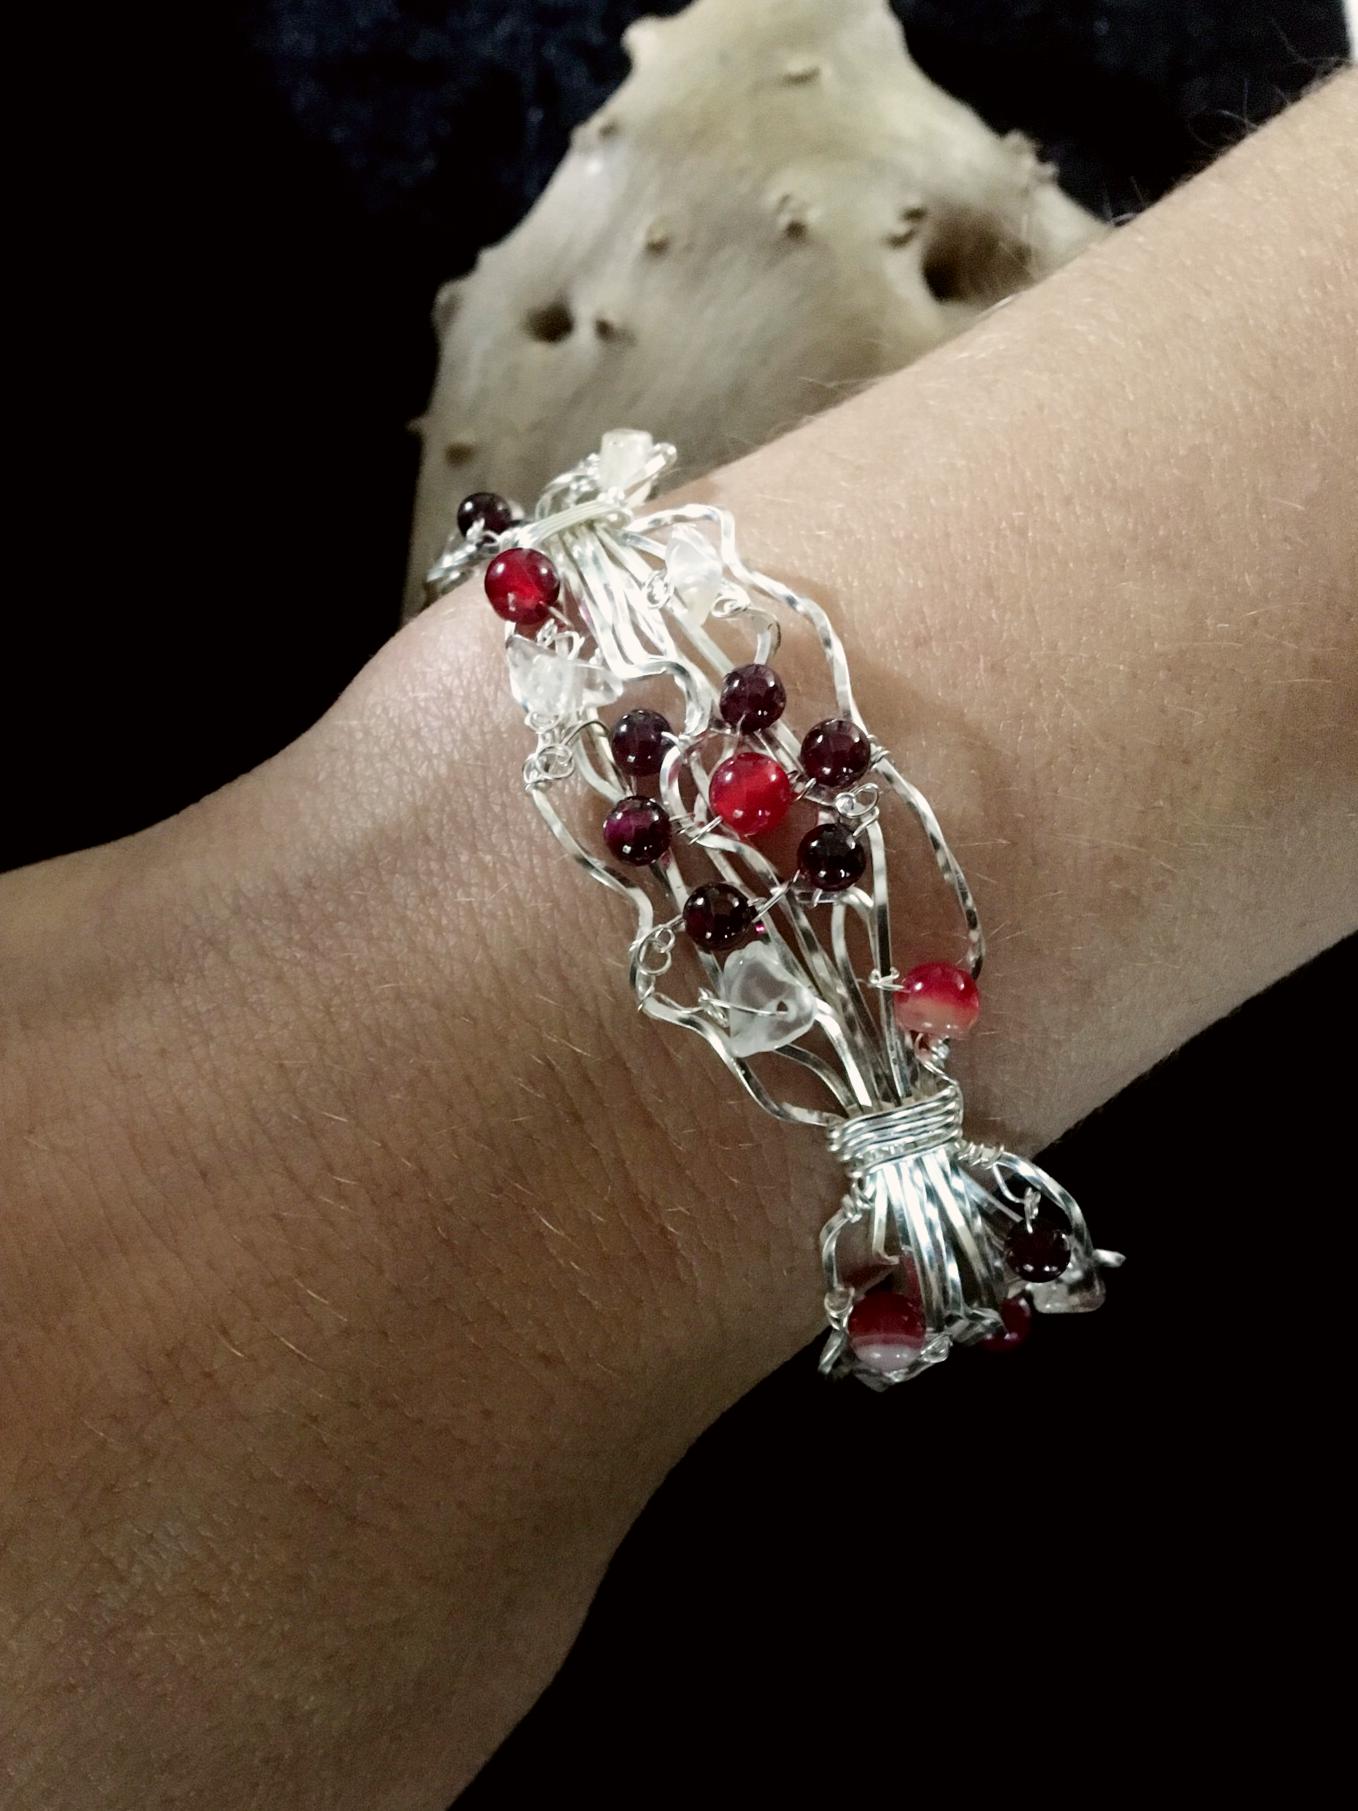 Qhresnna Quartz Bracelet - Red Agathe and granate - Silver Plated